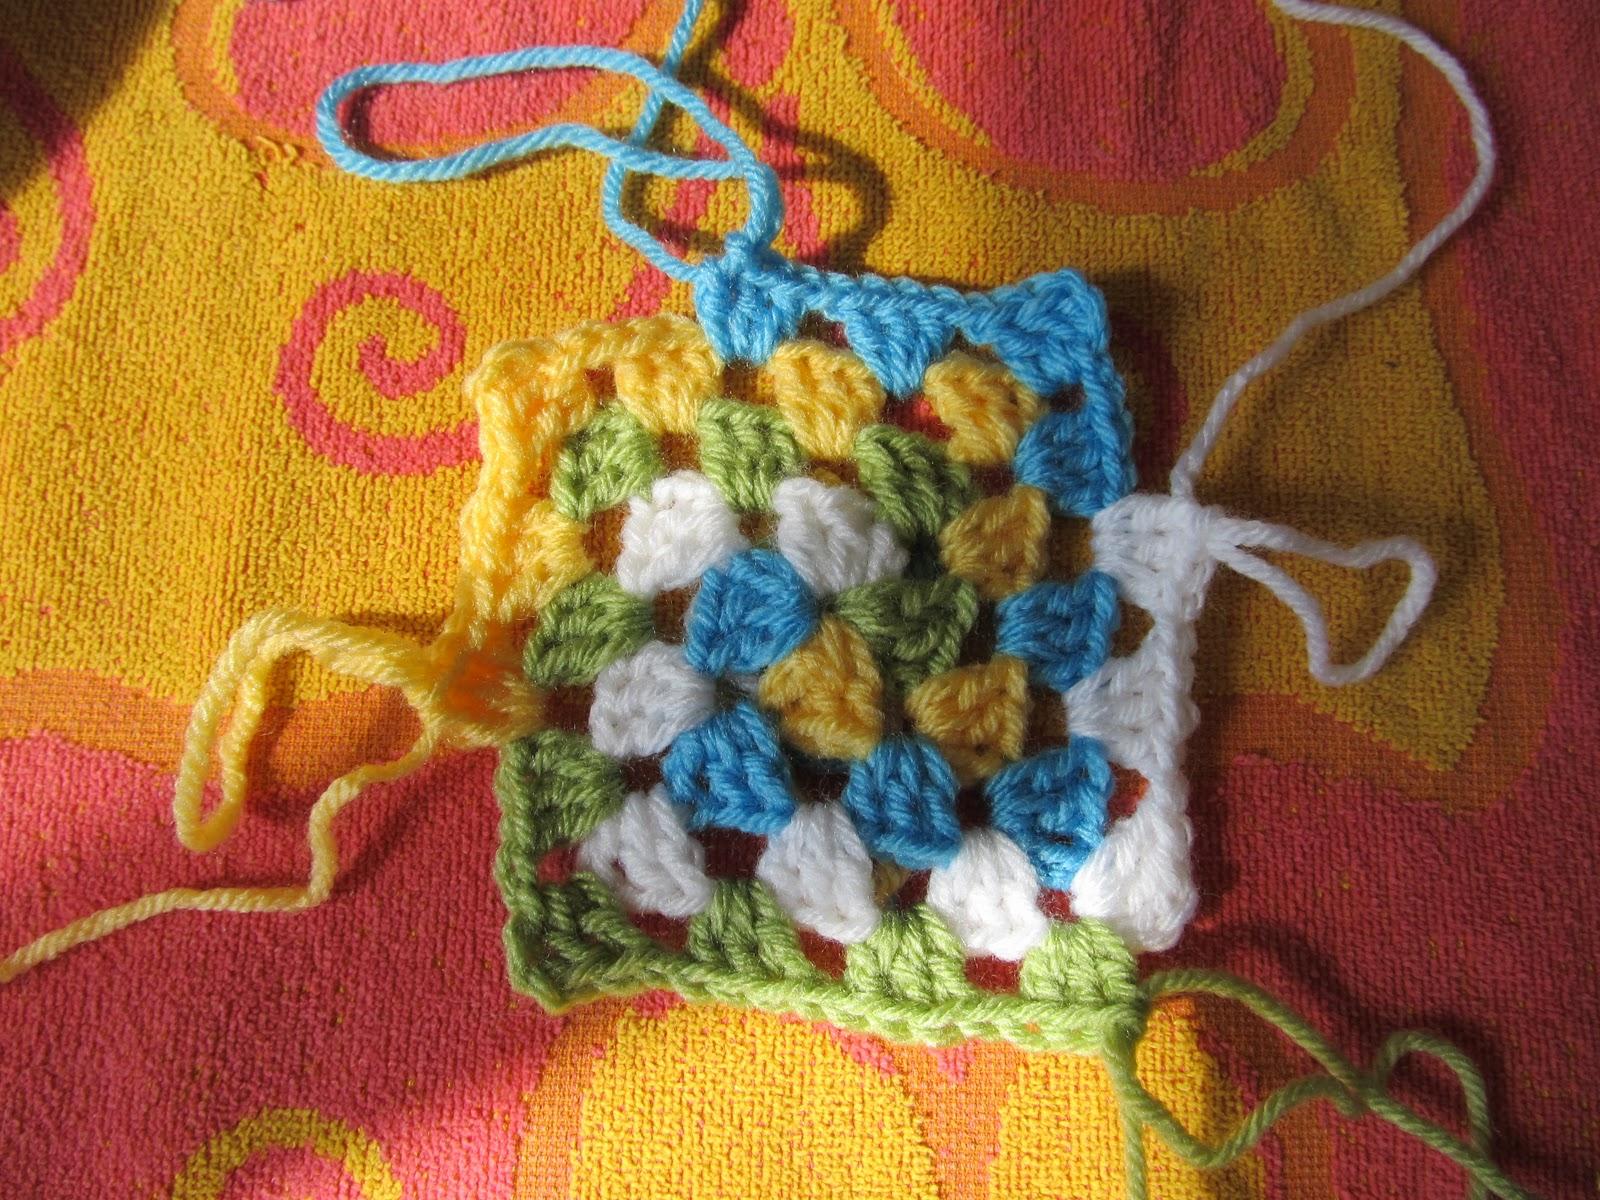 Free Crochet Pattern Spiral Granny Square : SmoothFox Crochet and Knit: SmoothFoxs Spiral Granny ...